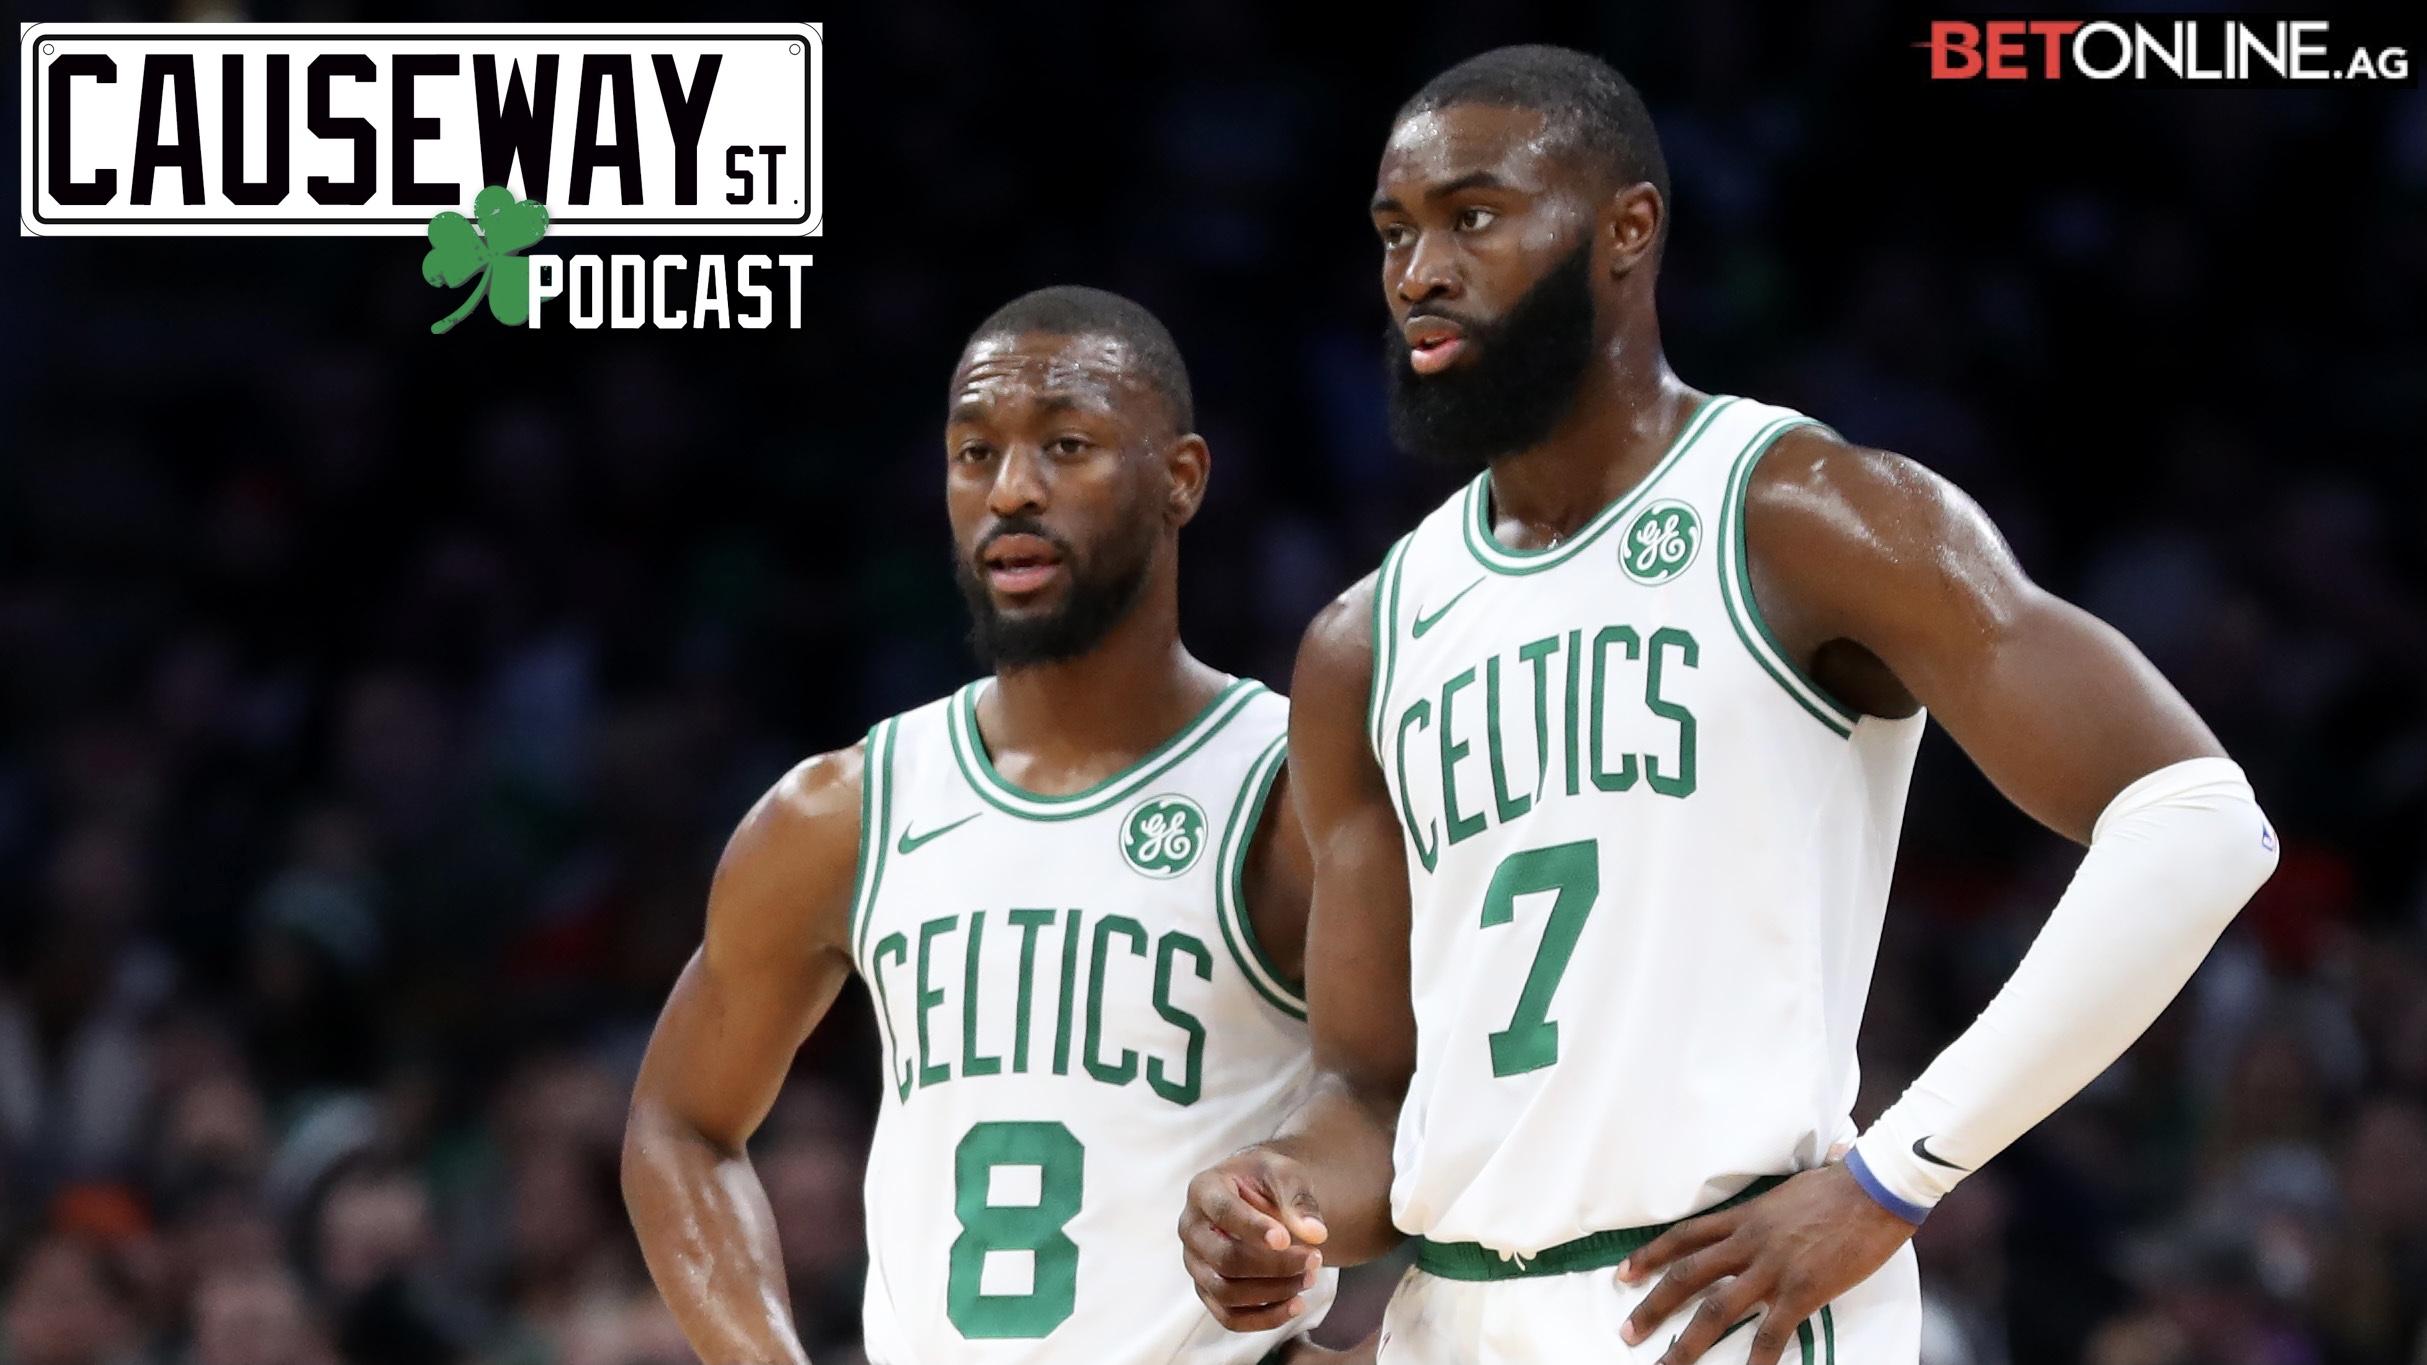 259: Celtics' health + Play-In Tournament